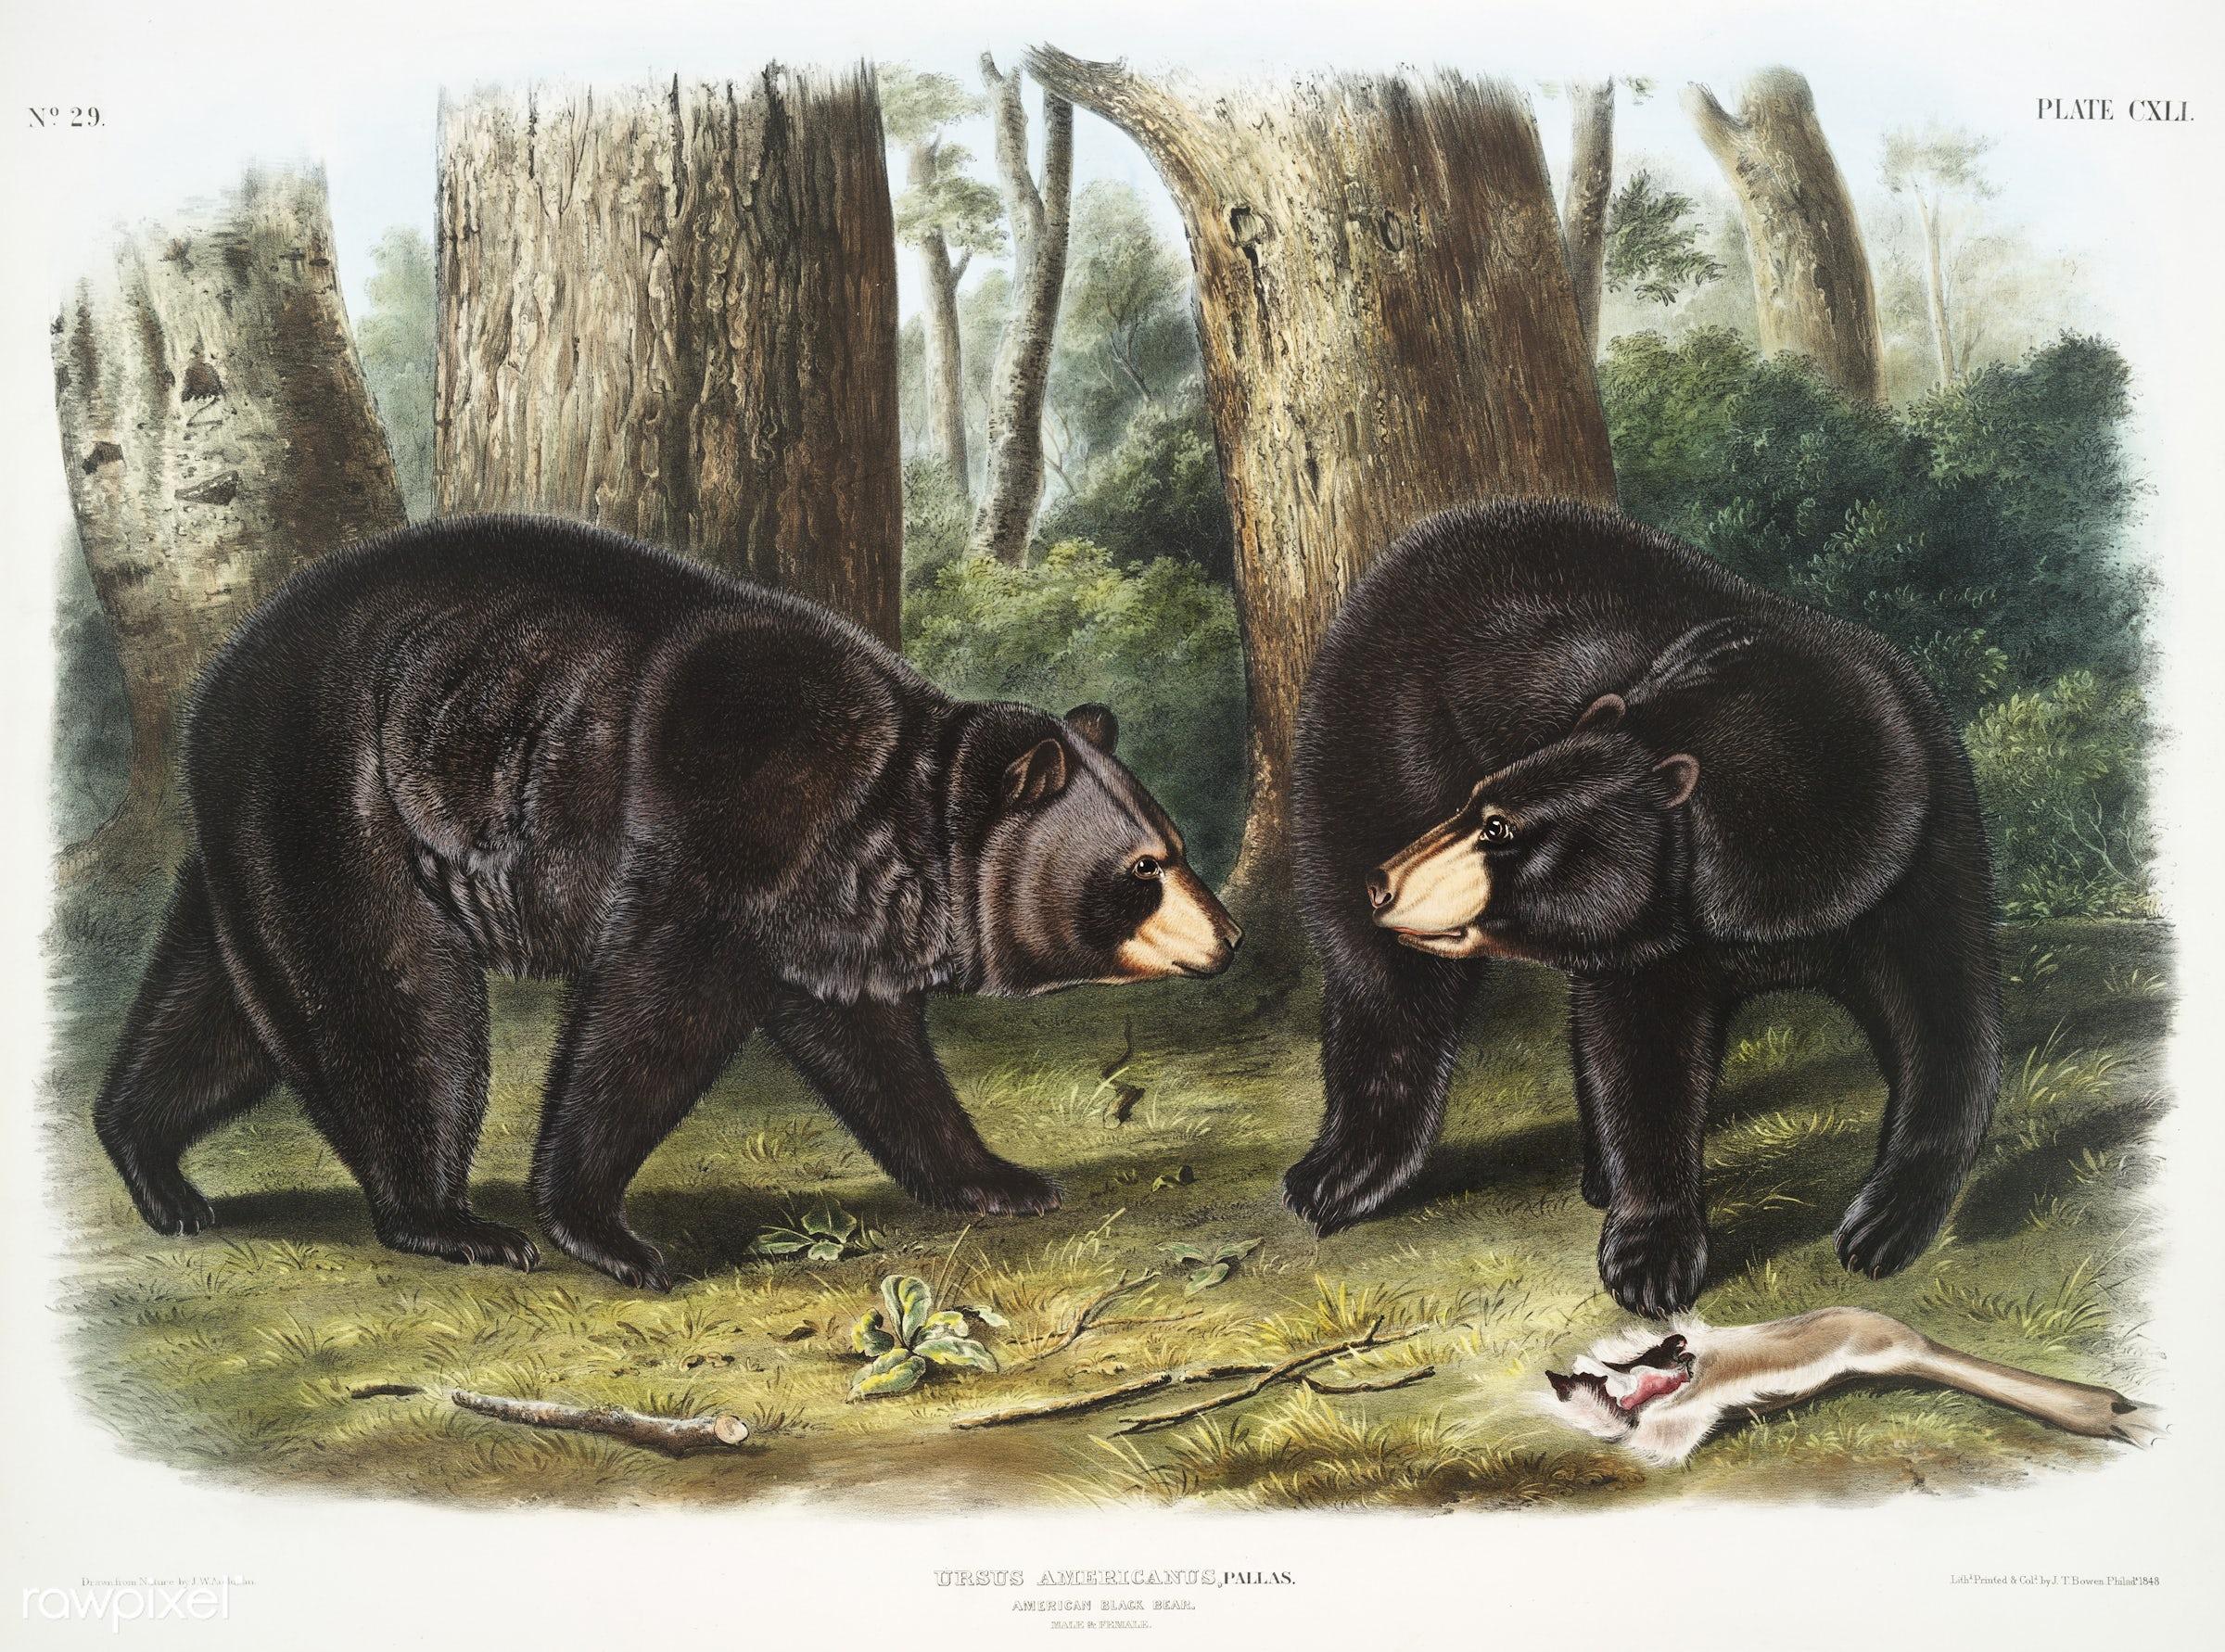 American Black Bear (Ursus Americanus) from the viviparous quadrupeds of North America (1845) illustrated by John Woodhouse...